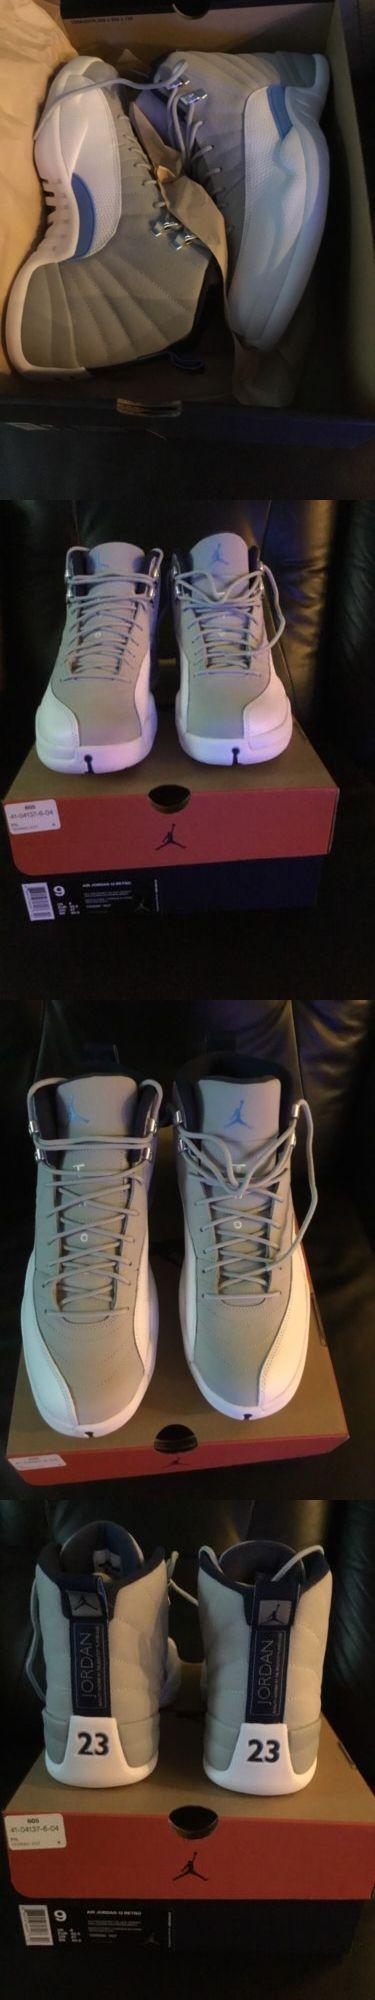 Men 158971: Mens Air Jordan Retro 12 Grey University Blue Basketball Shoes Size 9 -> BUY IT NOW ONLY: $274.99 on eBay!